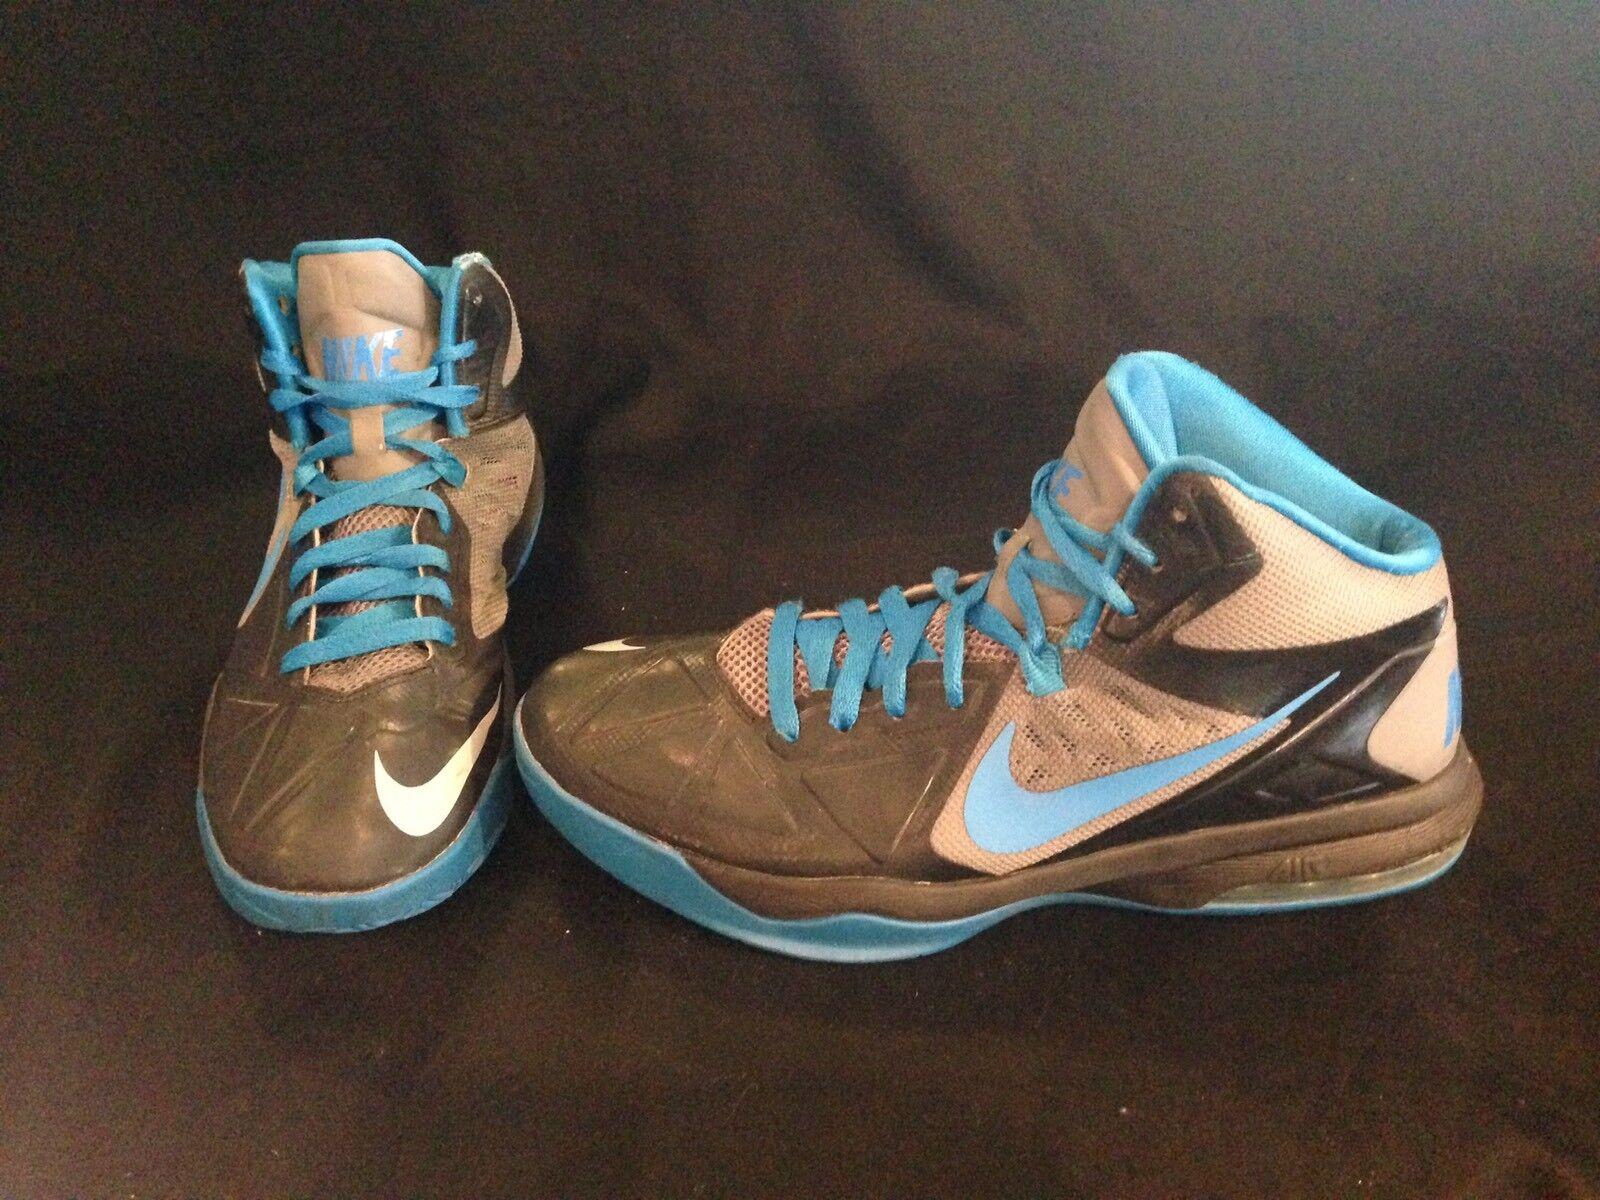 Nike Air Max Body U manstorlek 9.5 svart / grå / foto blå 599350-004